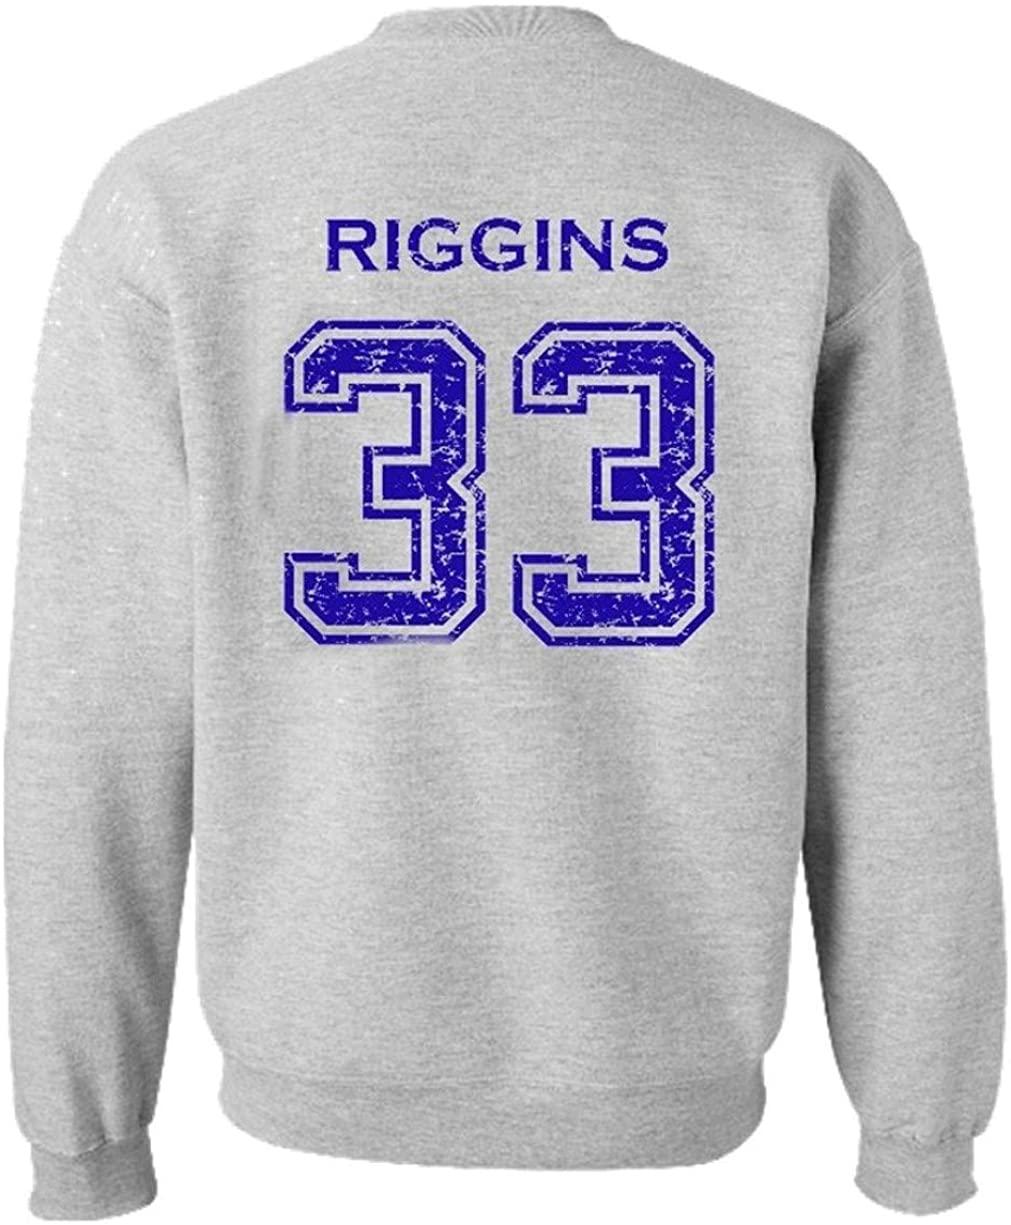 Adult Dillon Panthers Football Riggins 33 Crewneck Sweatshirt